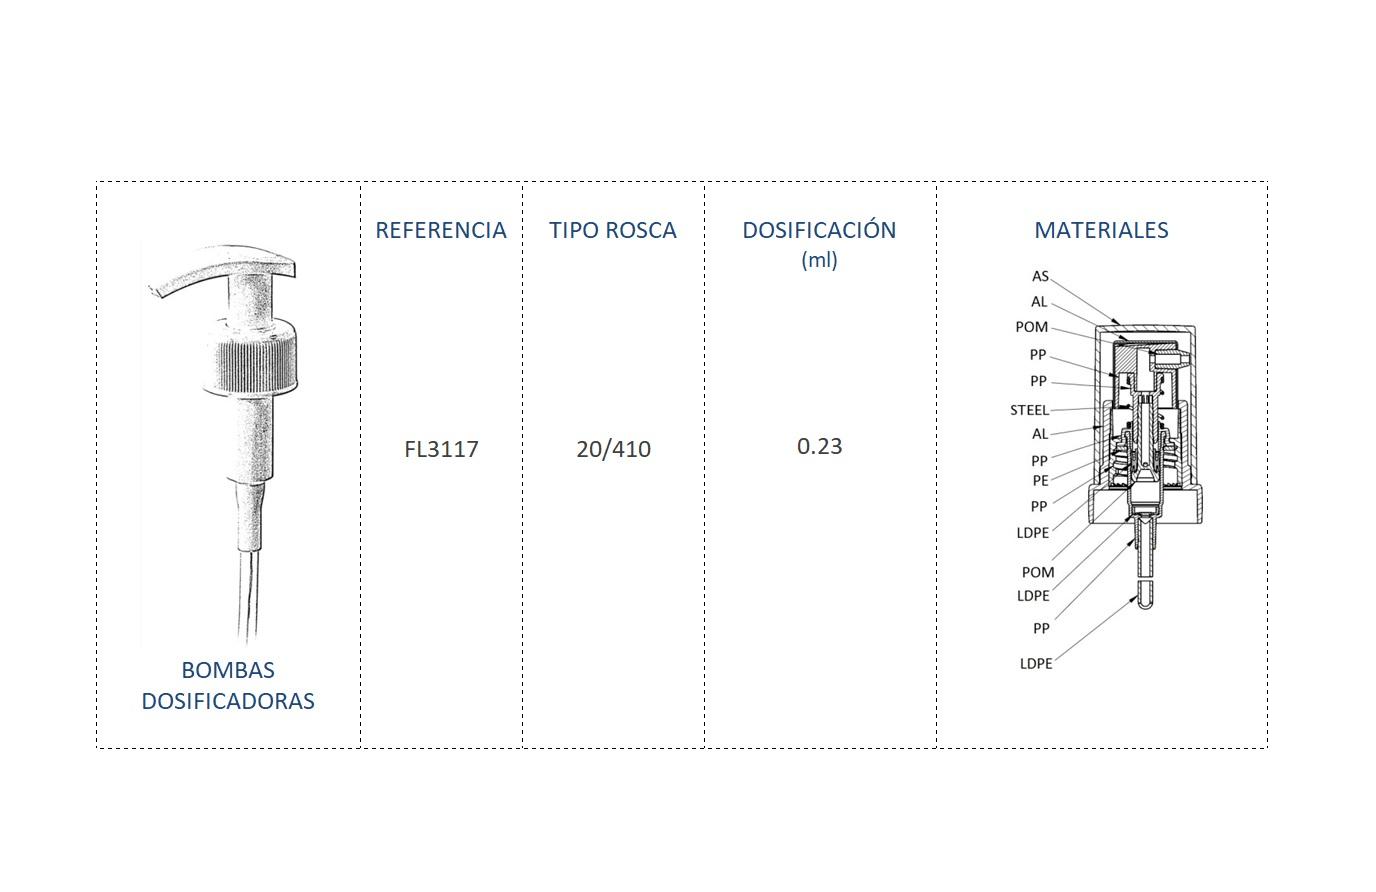 Cuadro de materiales bomba dosificadora FL3117 20-410